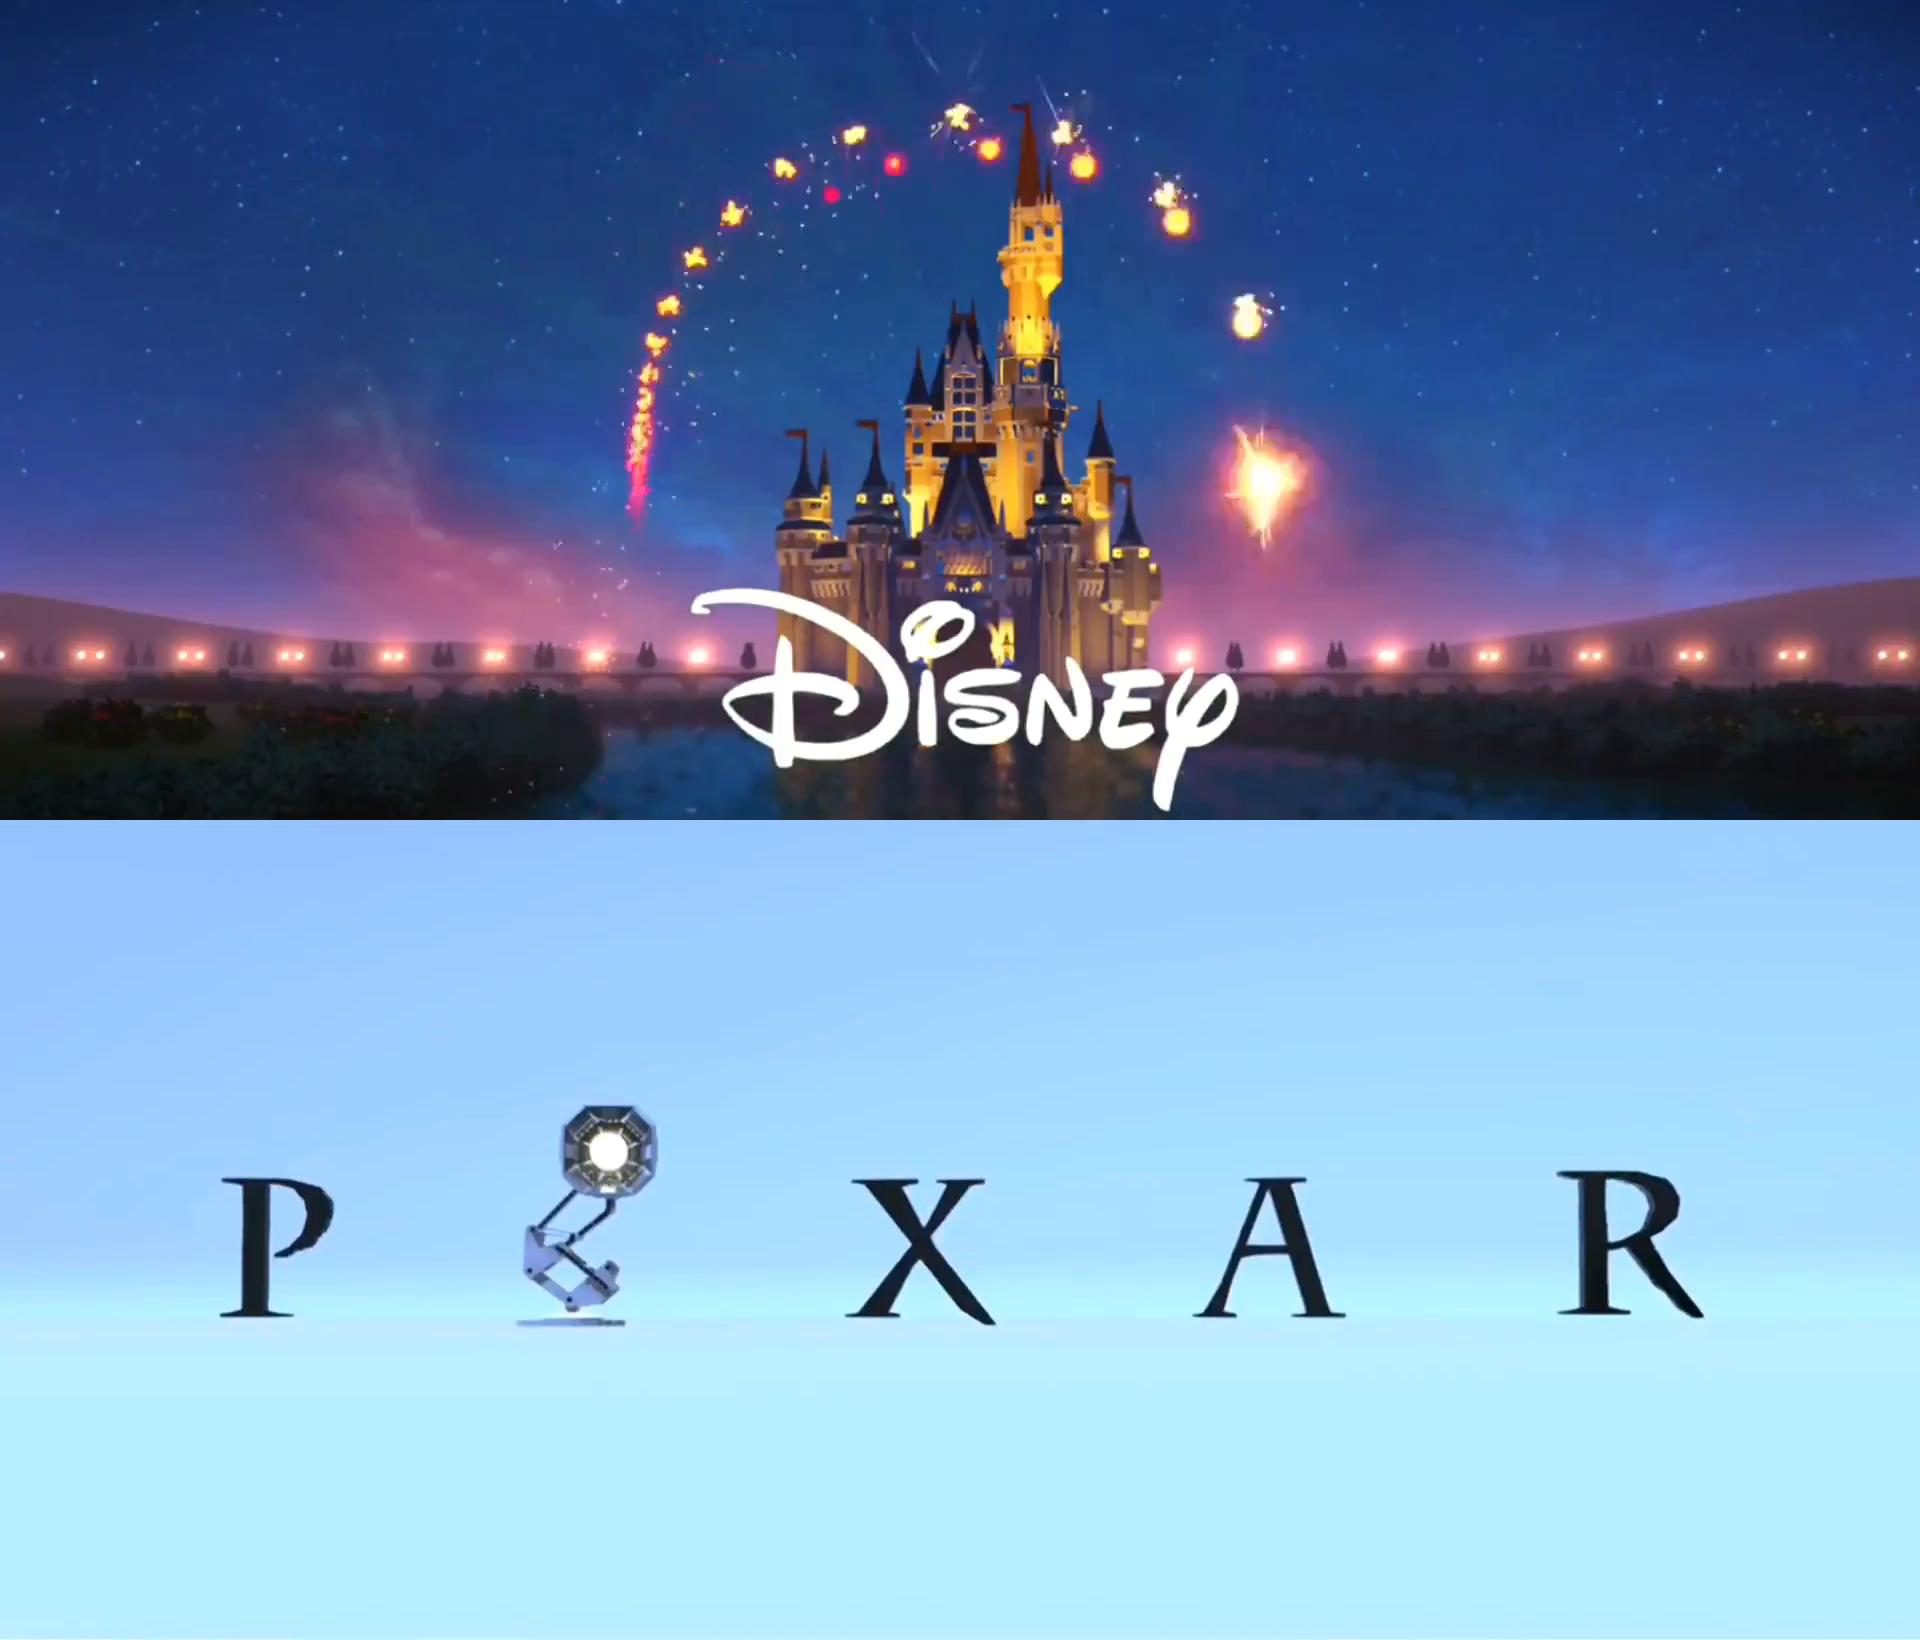 Walt Disney Pictures And Pixar Animation Studios By Esteveztheart On Deviantart